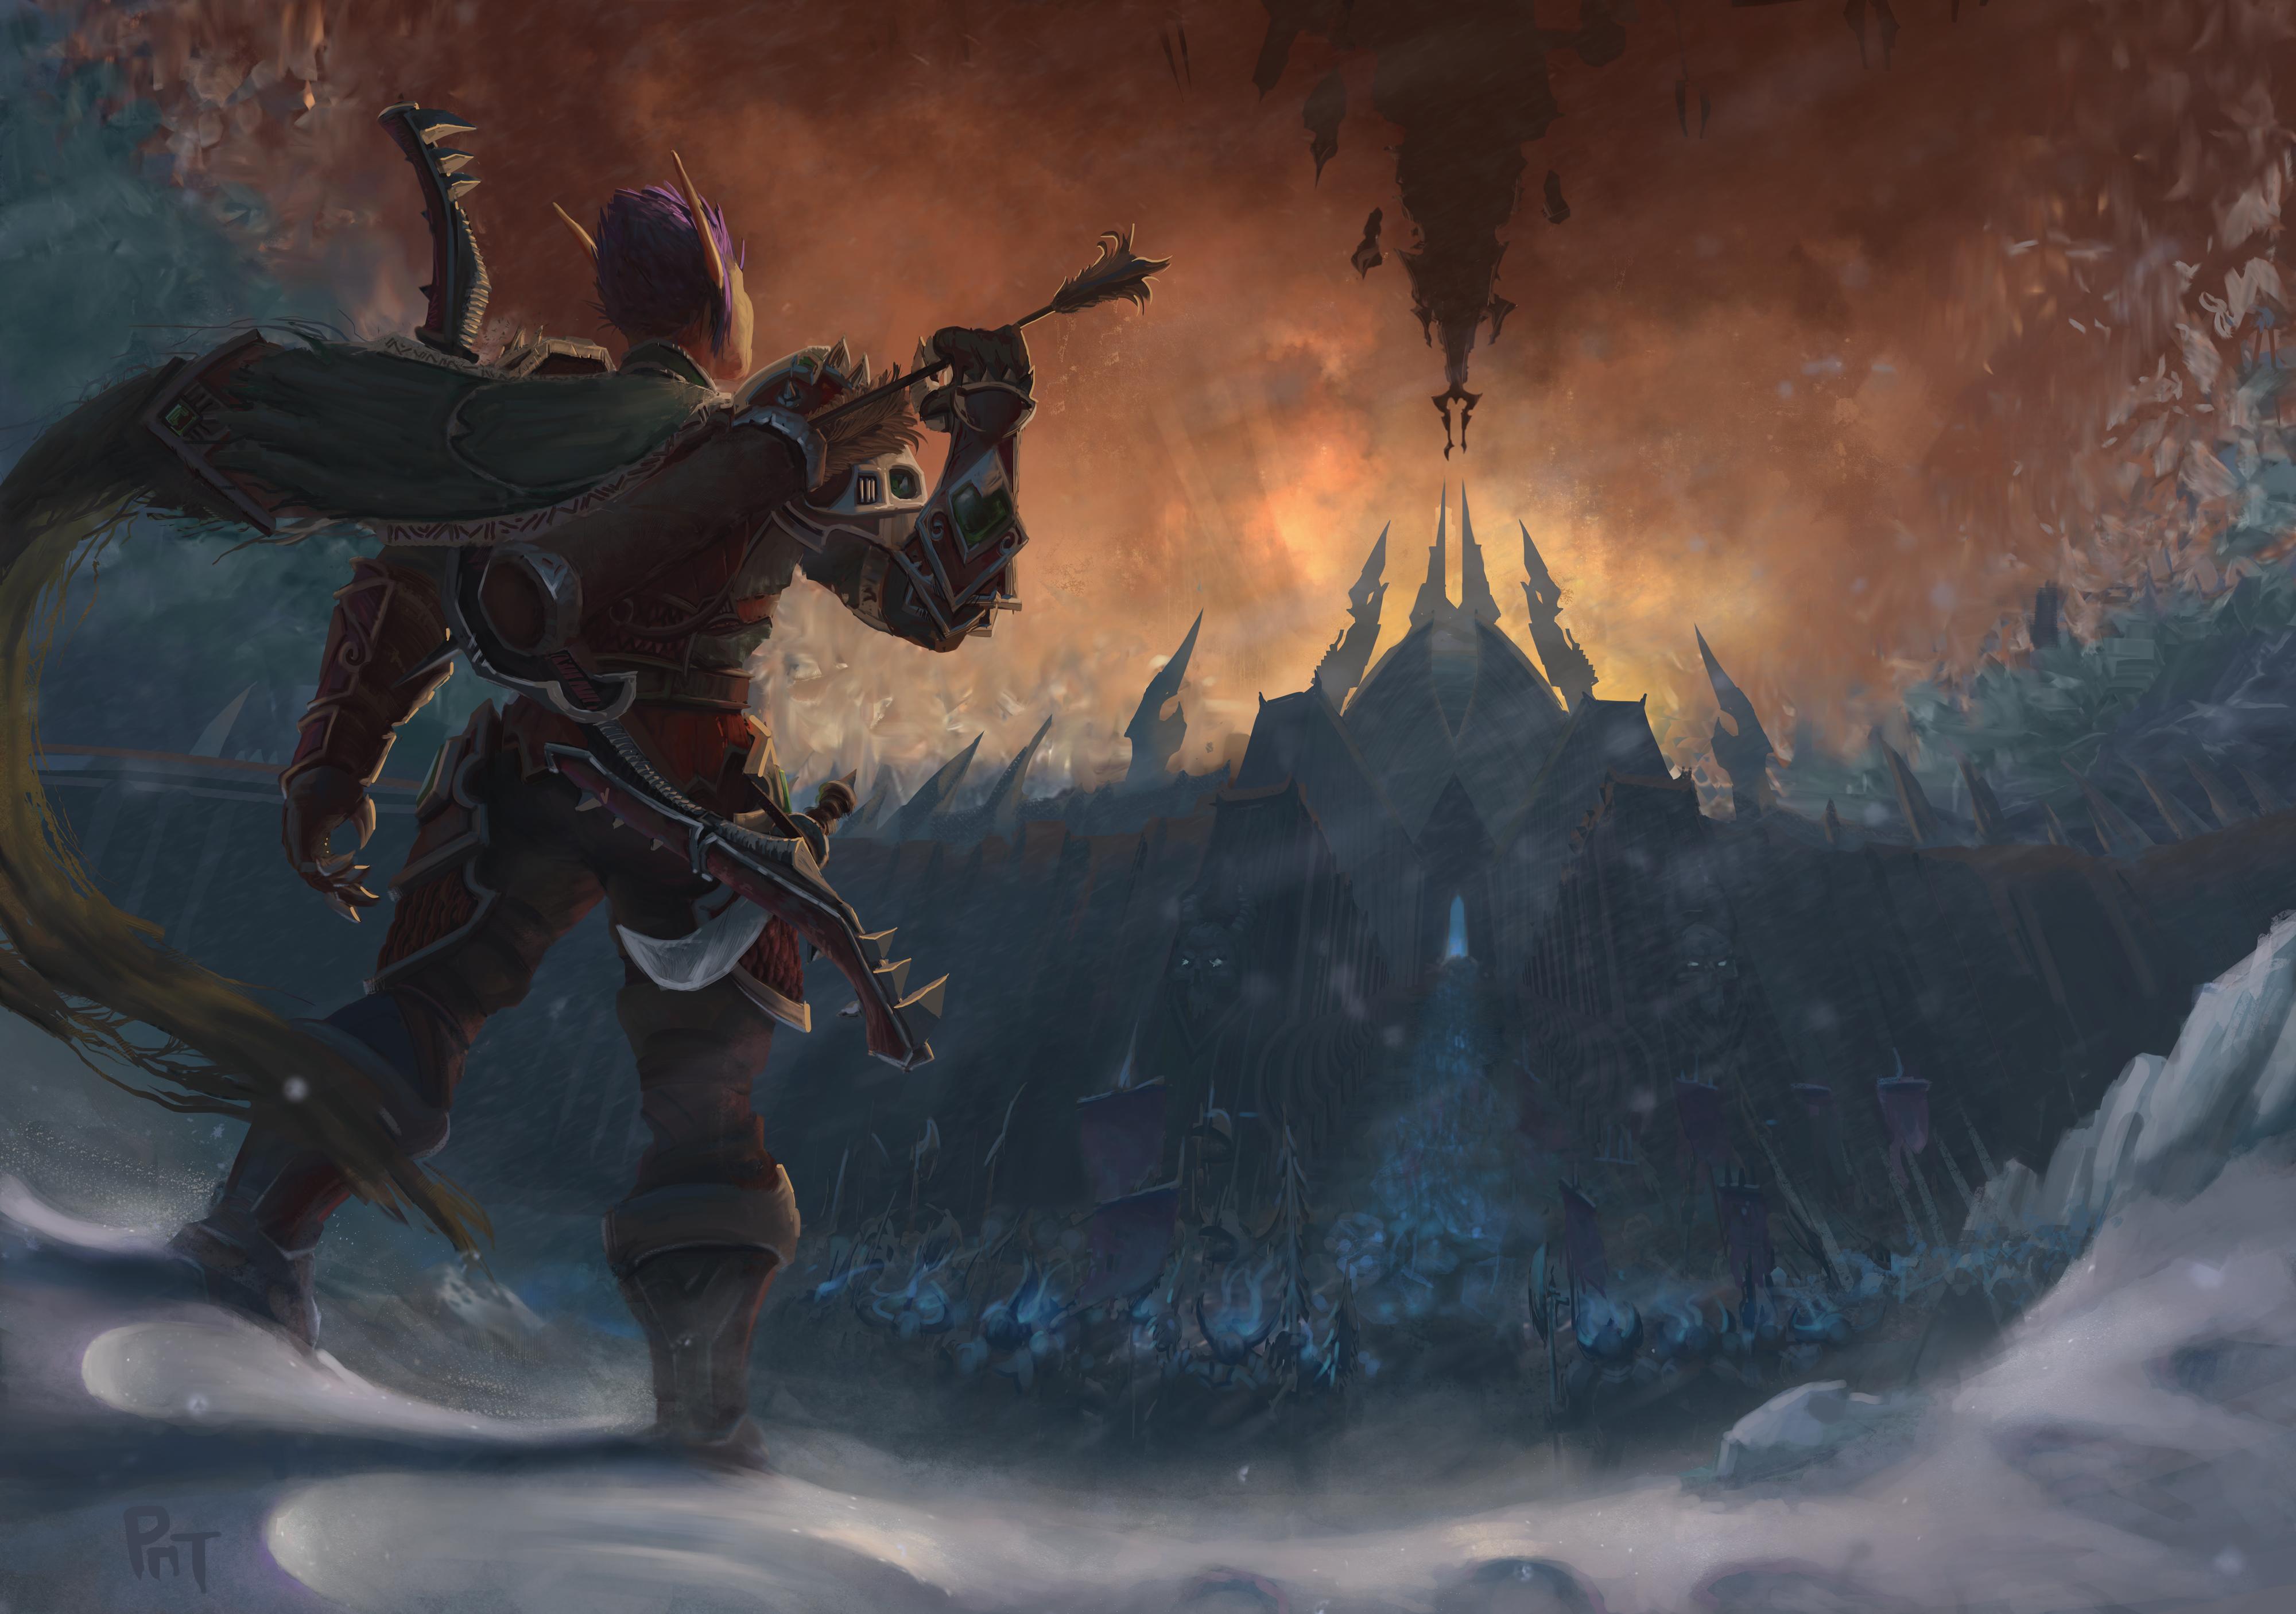 world of warcraft shadowlands wallpaper 2560x1440